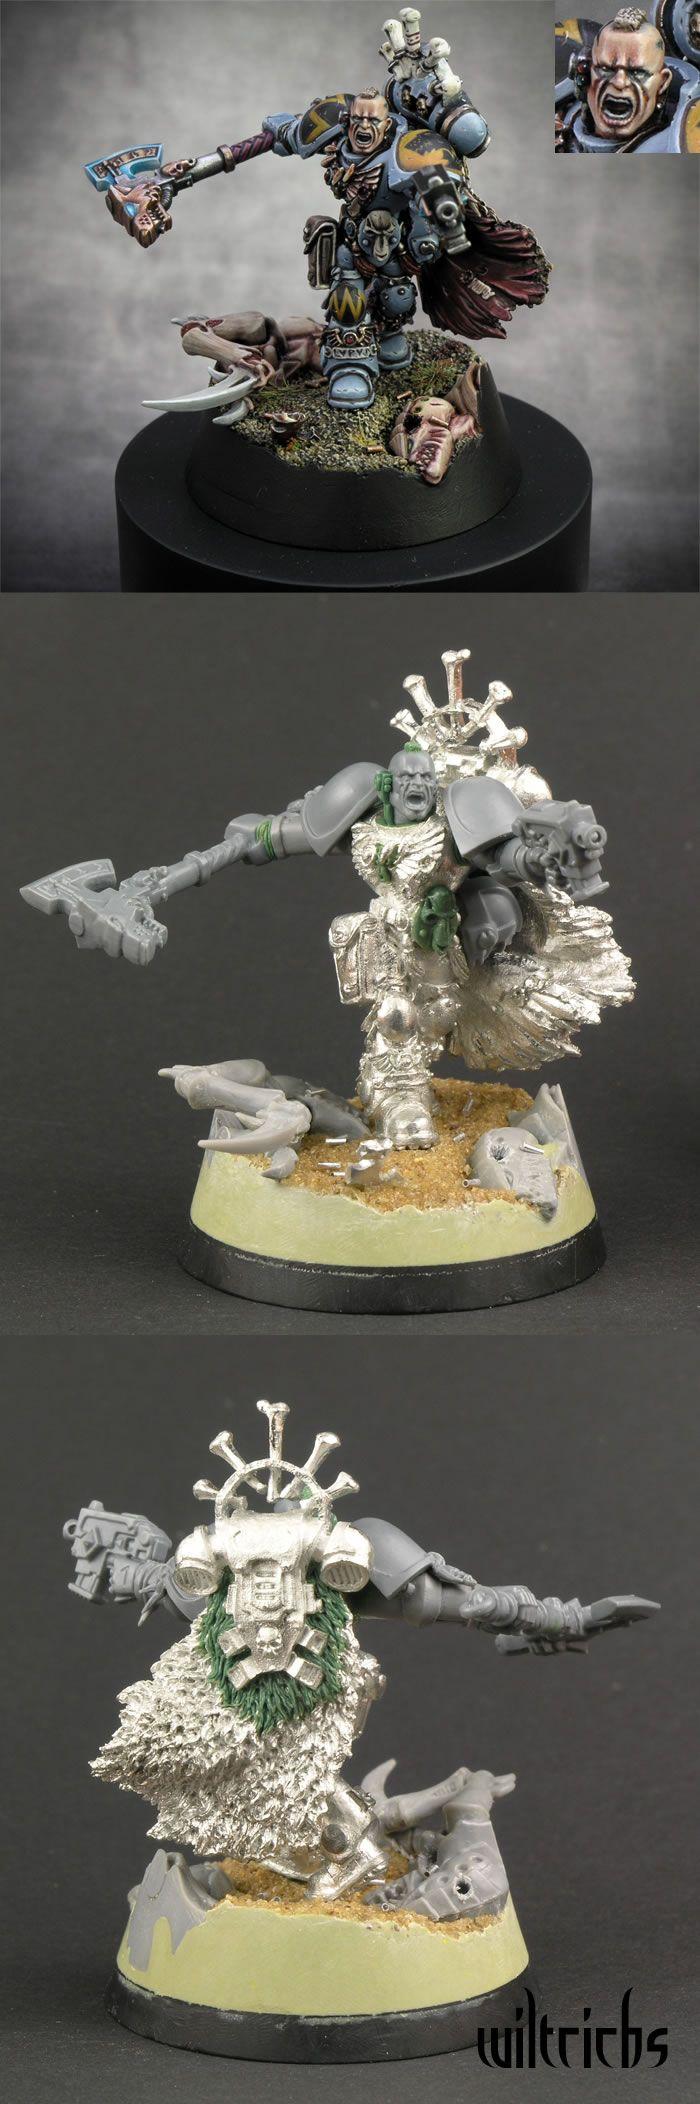 Space Wolves Wolf Guard Battle Leader (Conversion Shots)